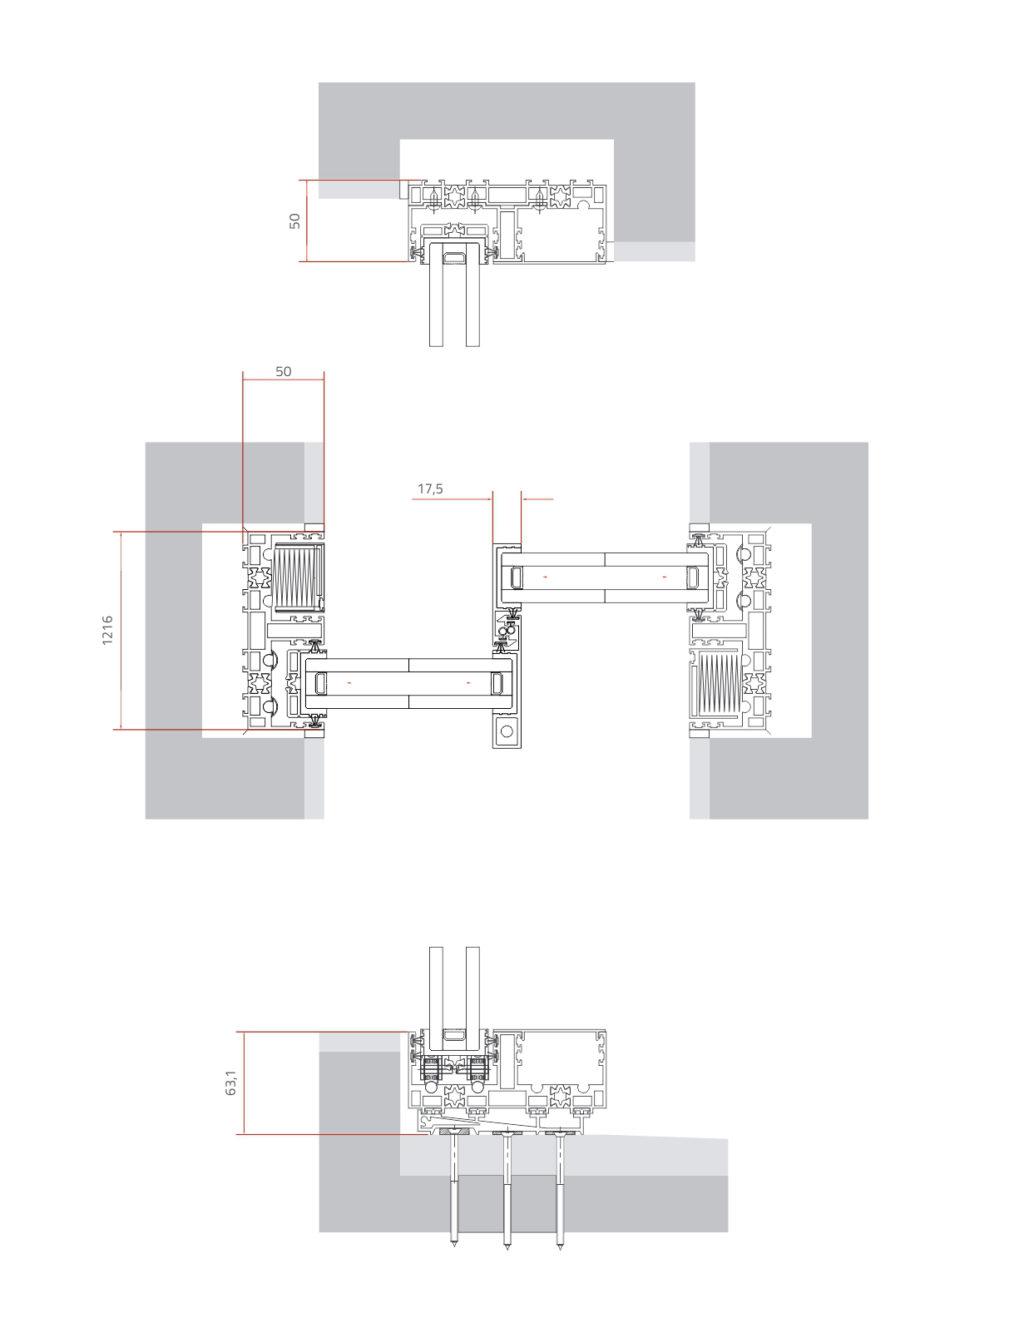 Technical_Diagram